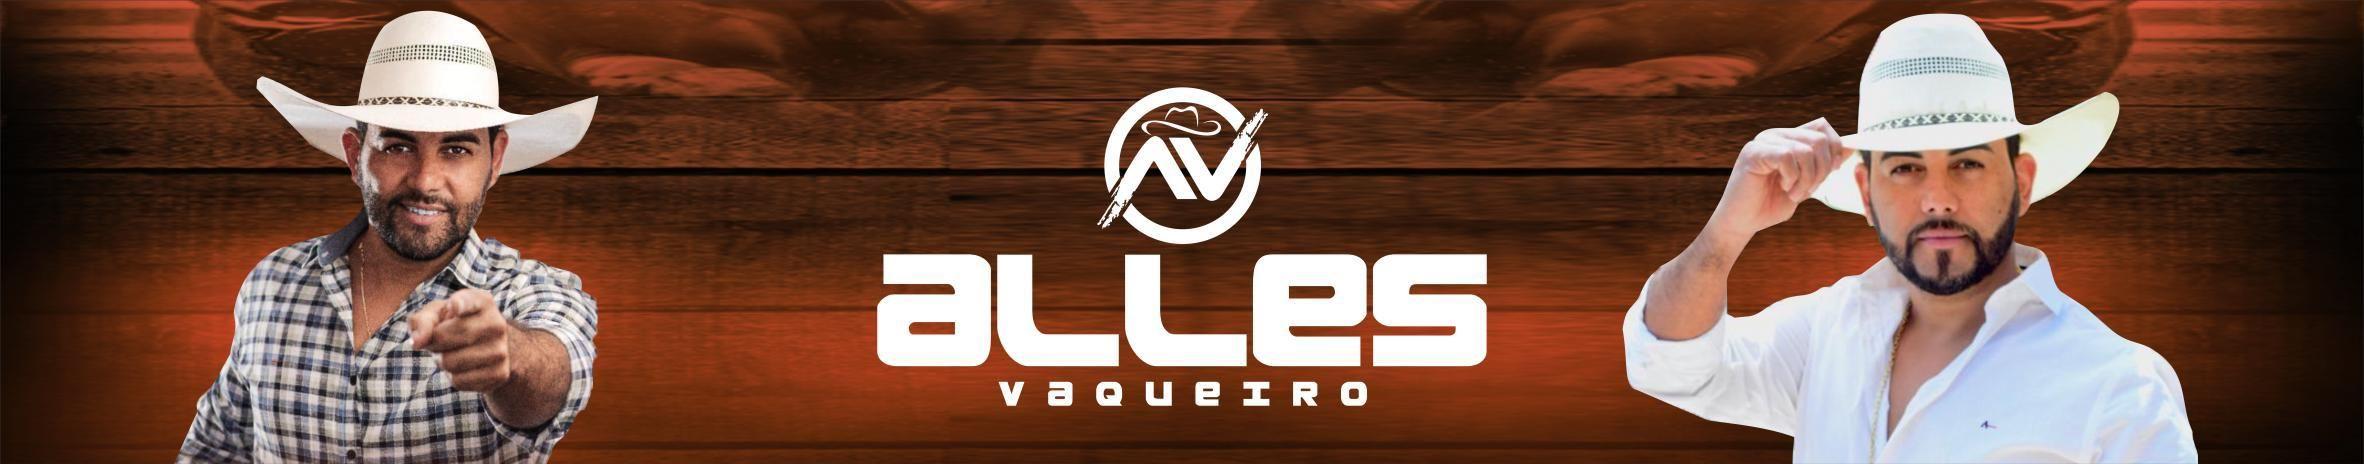 Imagem de capa de Alles Vaqueiro